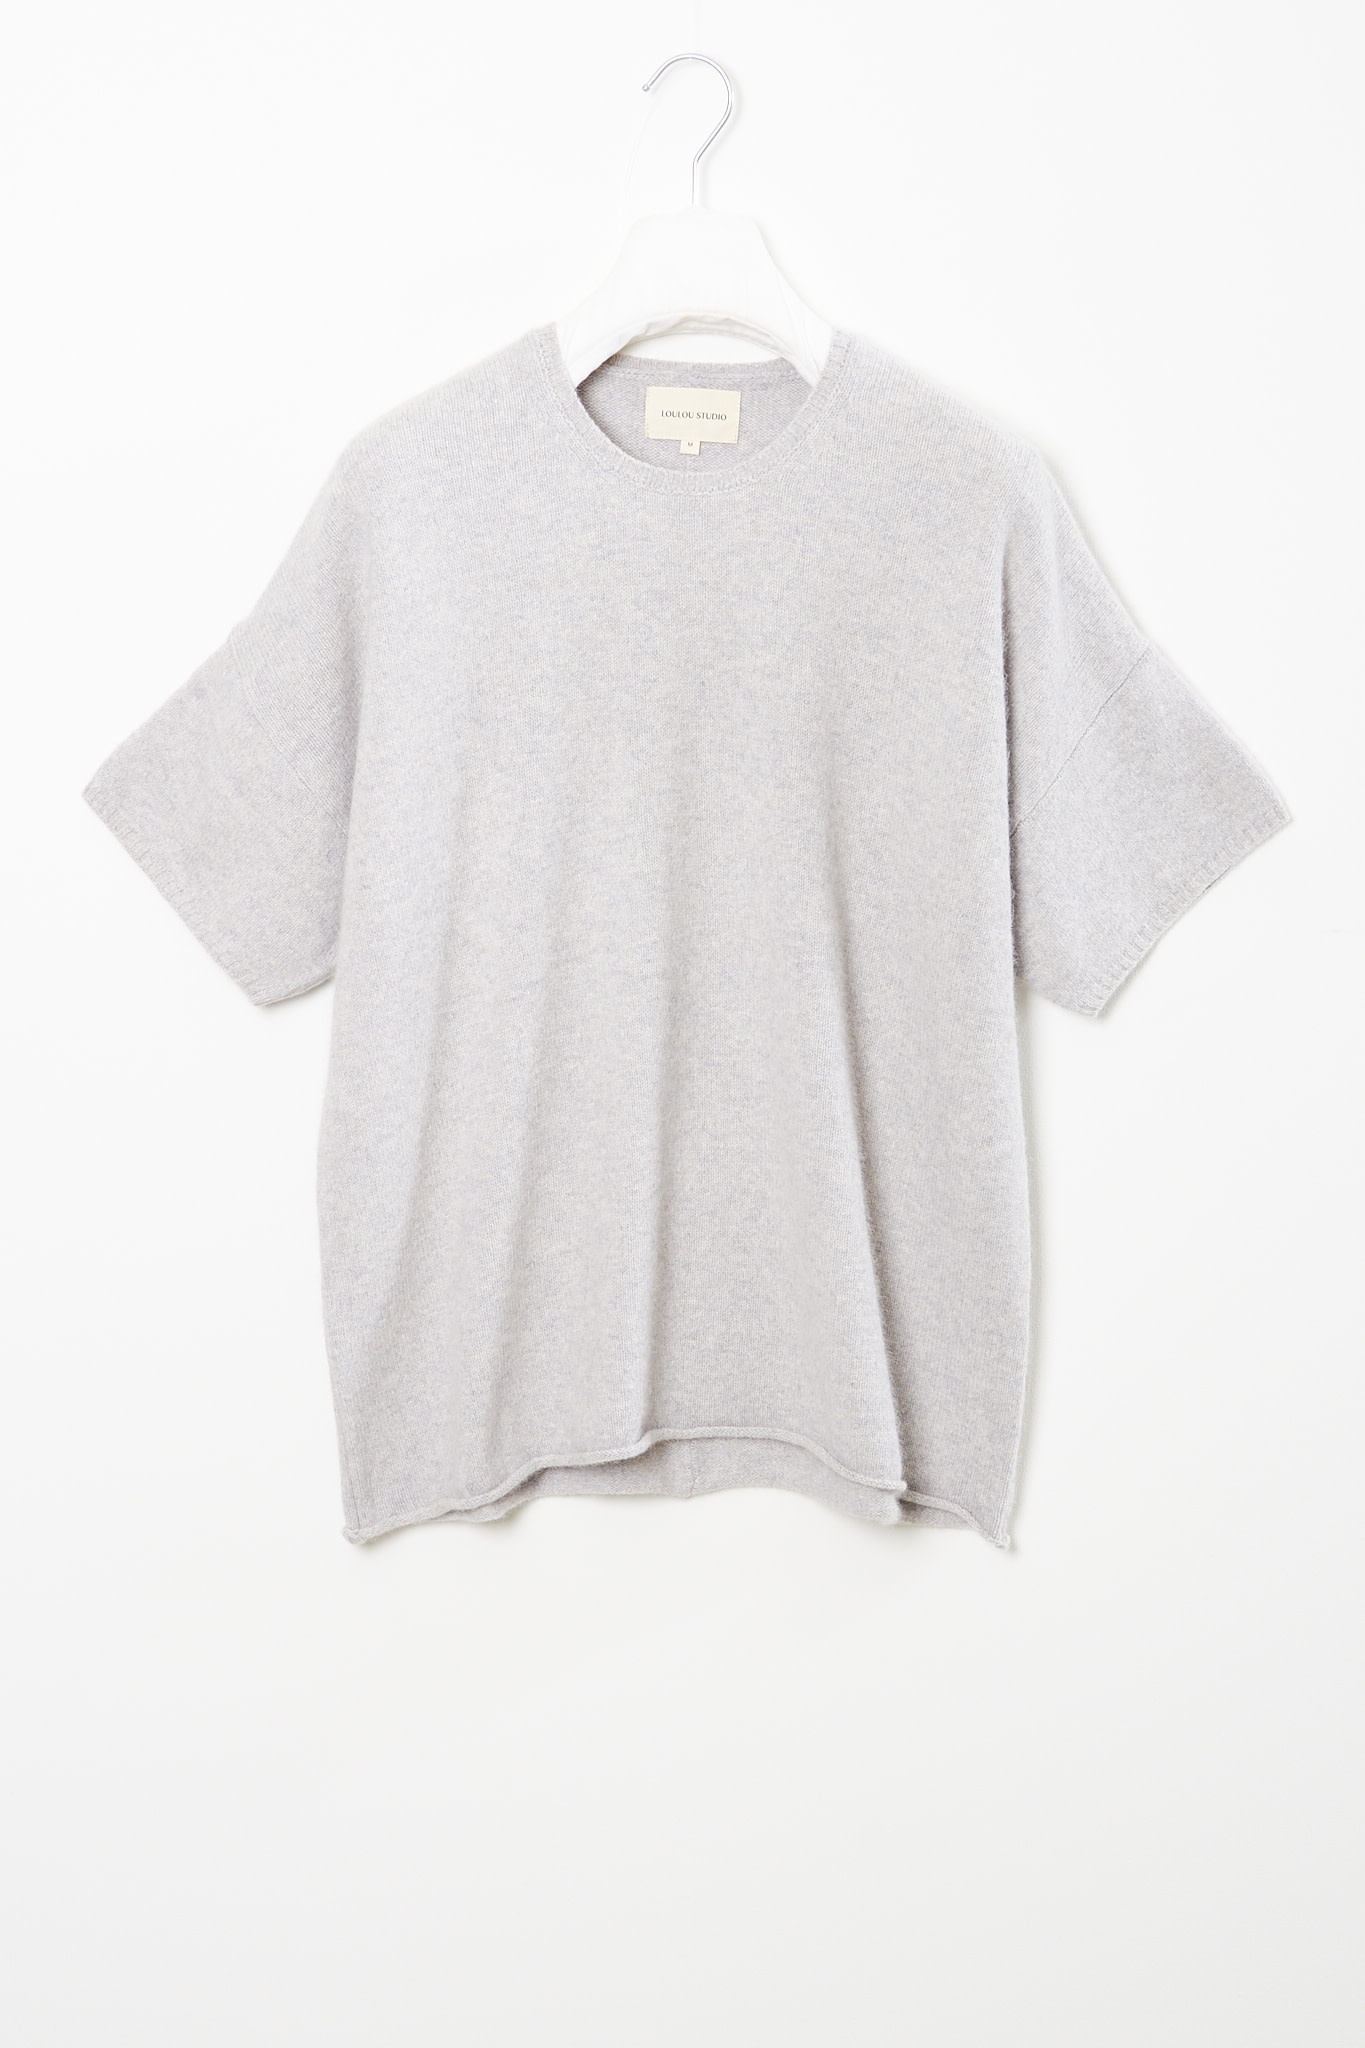 loulou studio - Izaro short sleeves sweater